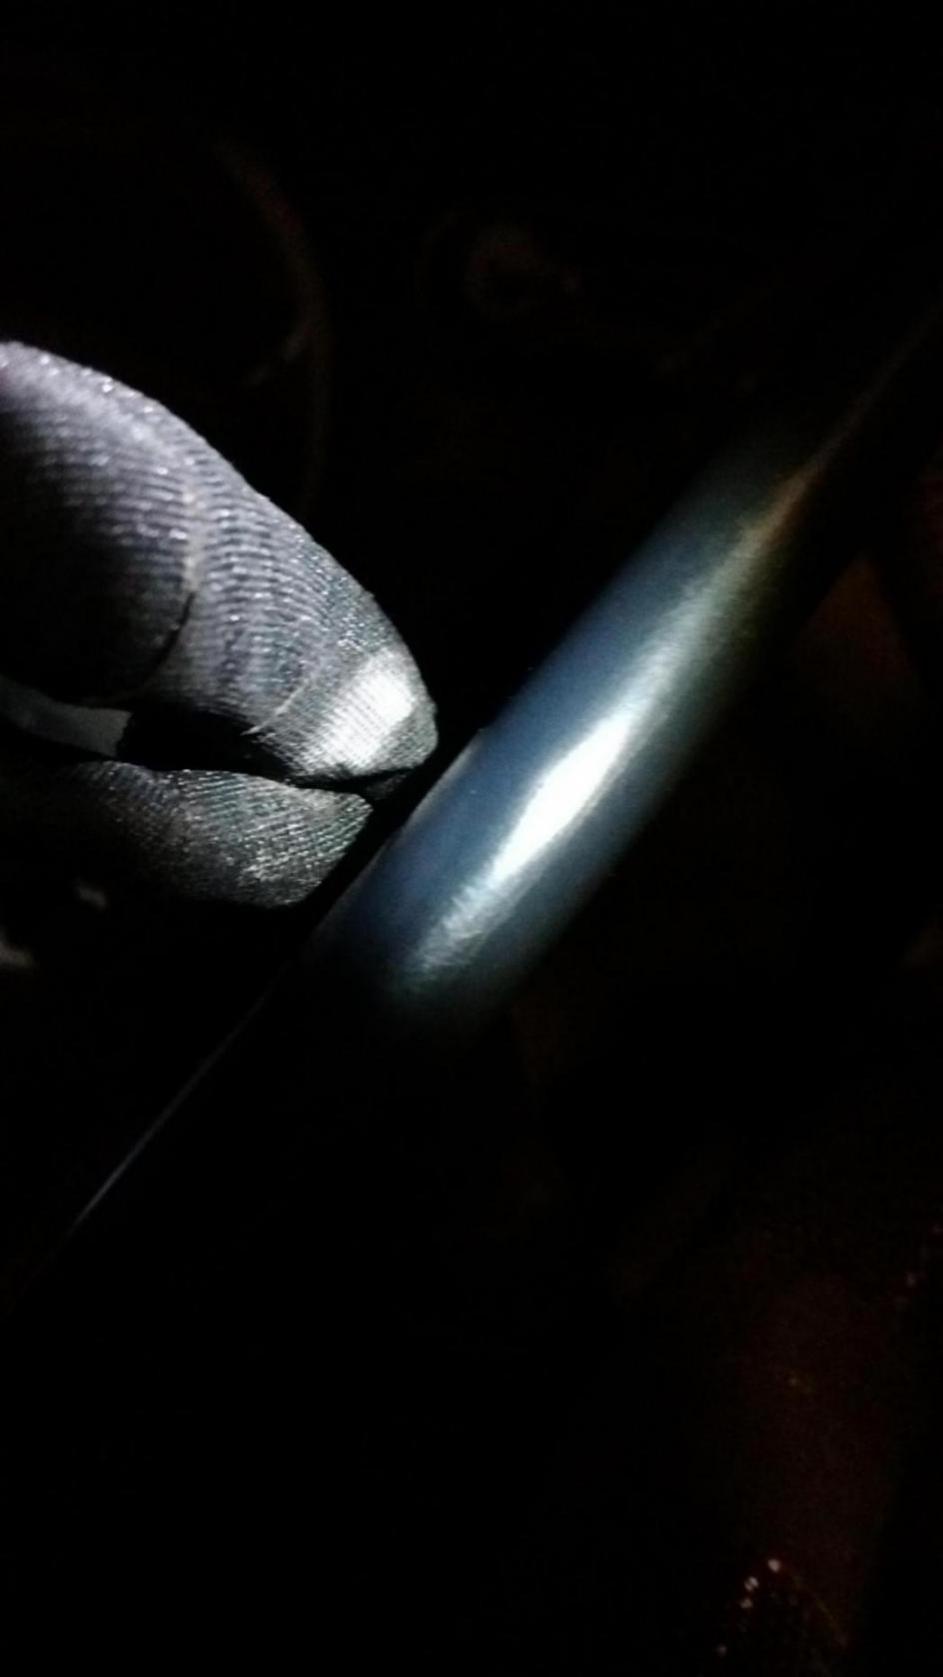 P0456 EVAP System Very Small Leak   Chrysler 300C & SRT8 Forums